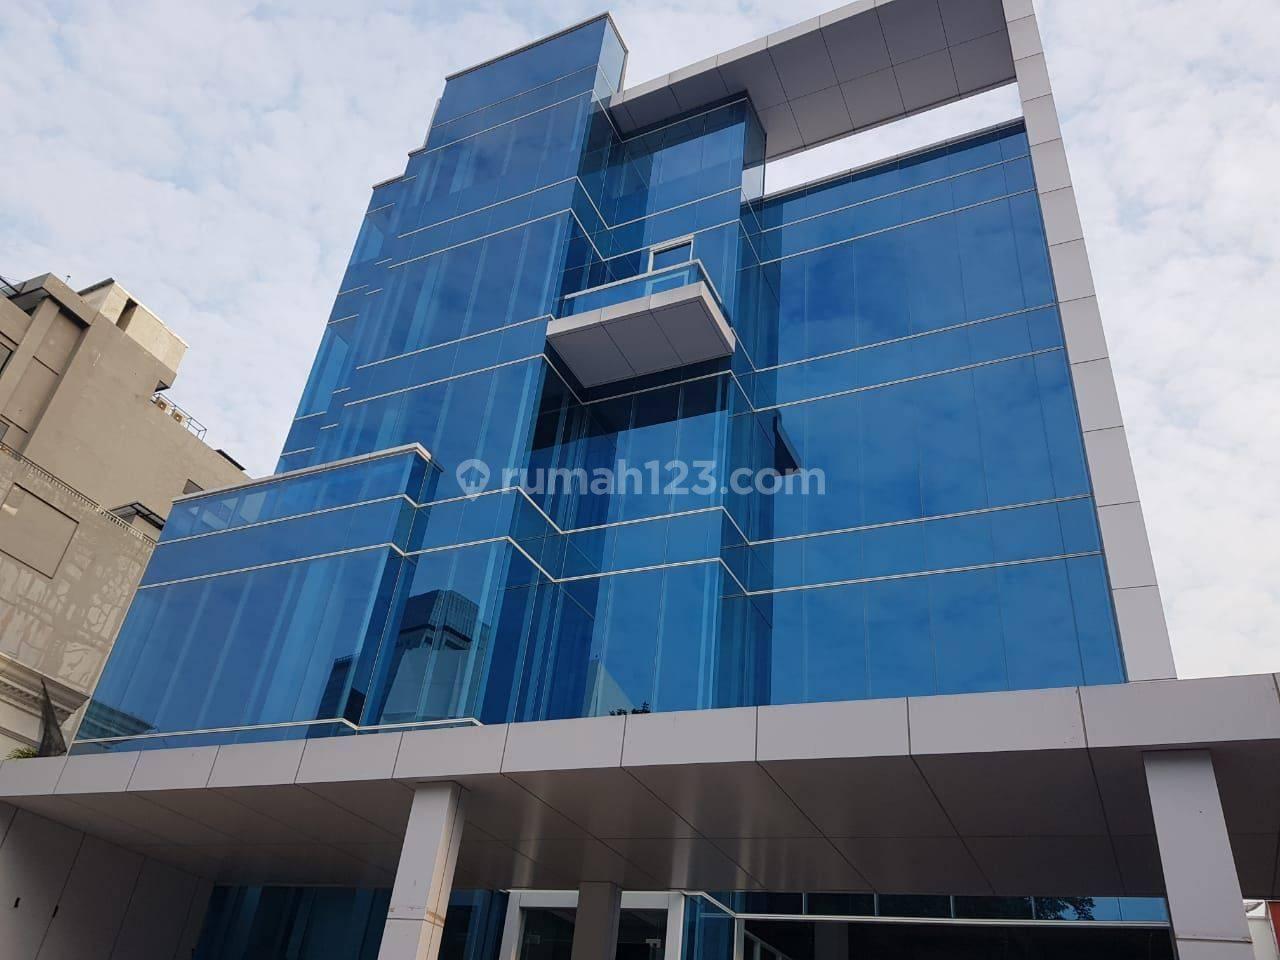 Gedung Kantor Baru di Kebon Sirih Jakarta Pusat, 4 lantai + basement